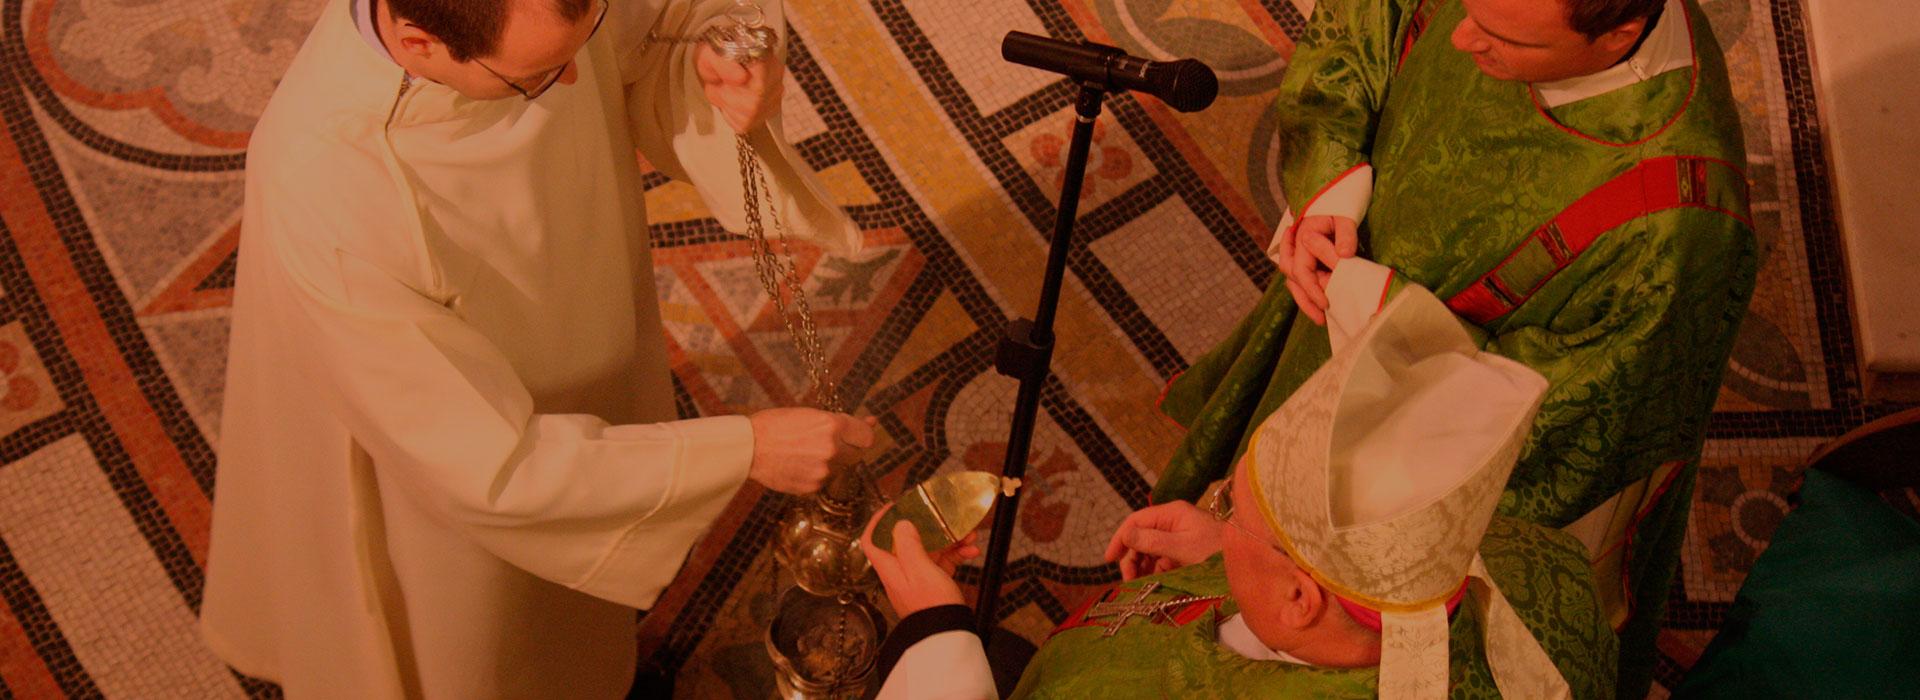 <center>Actividades y Fiestas Religiosas</center>